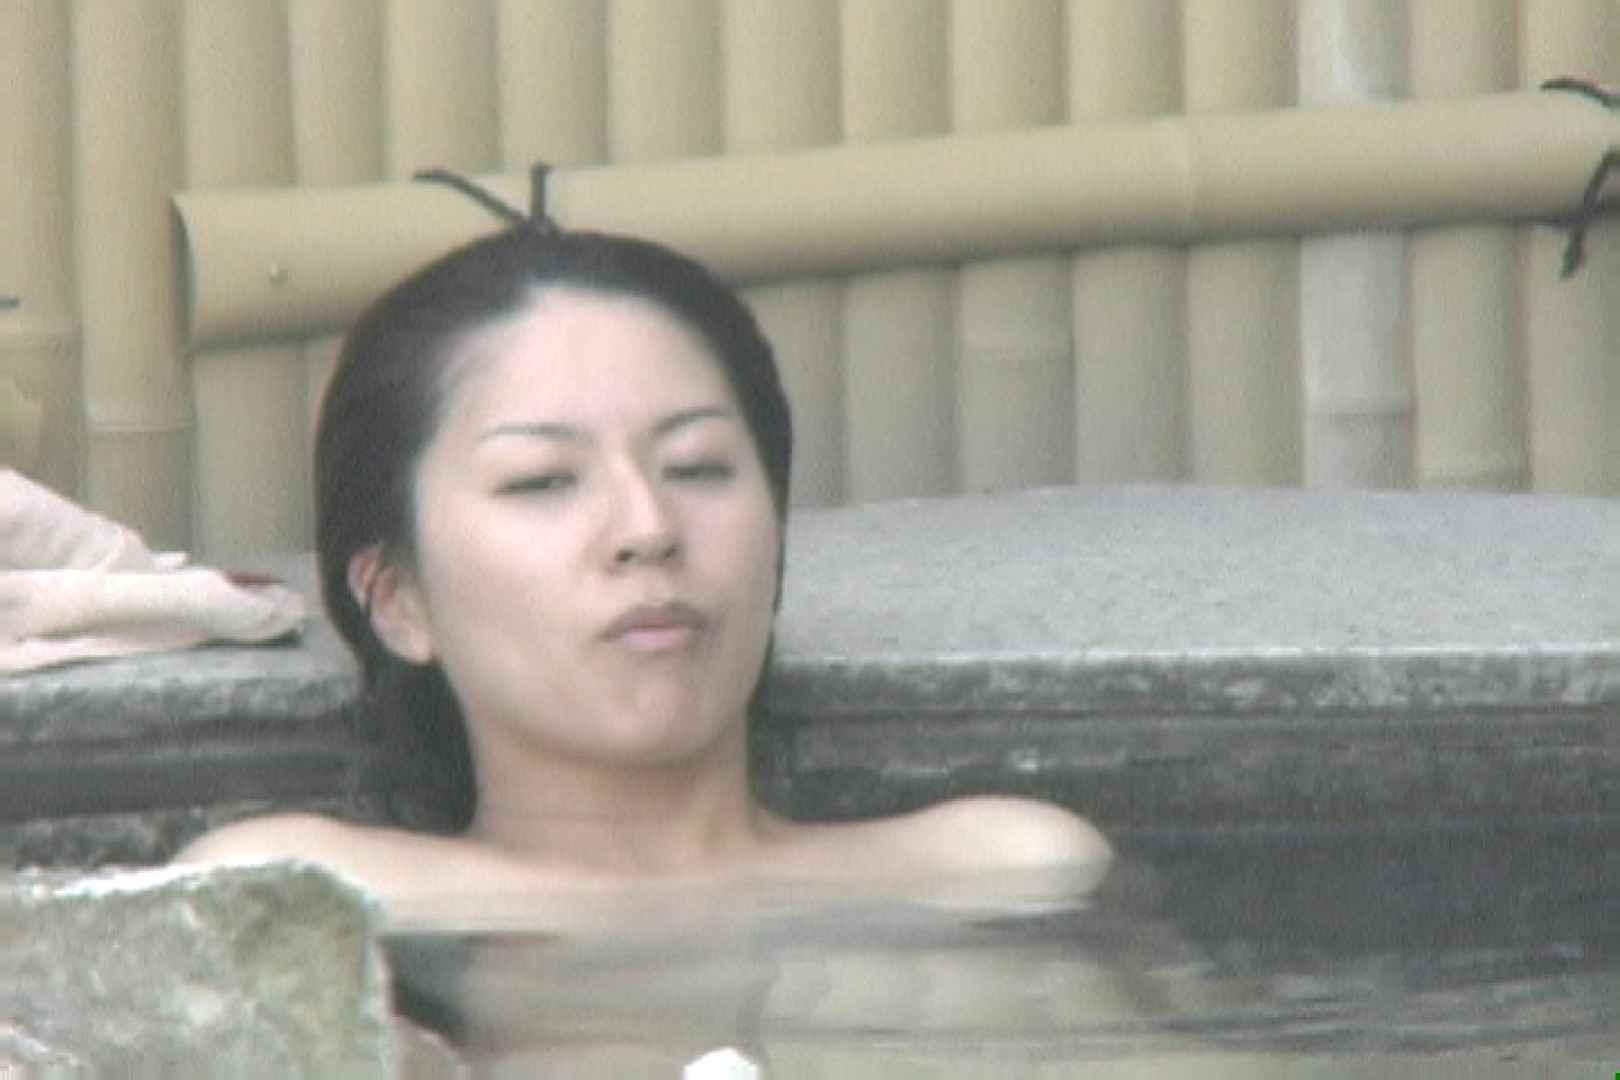 Aquaな露天風呂Vol.694 露天 オメコ無修正動画無料 110PICs 50